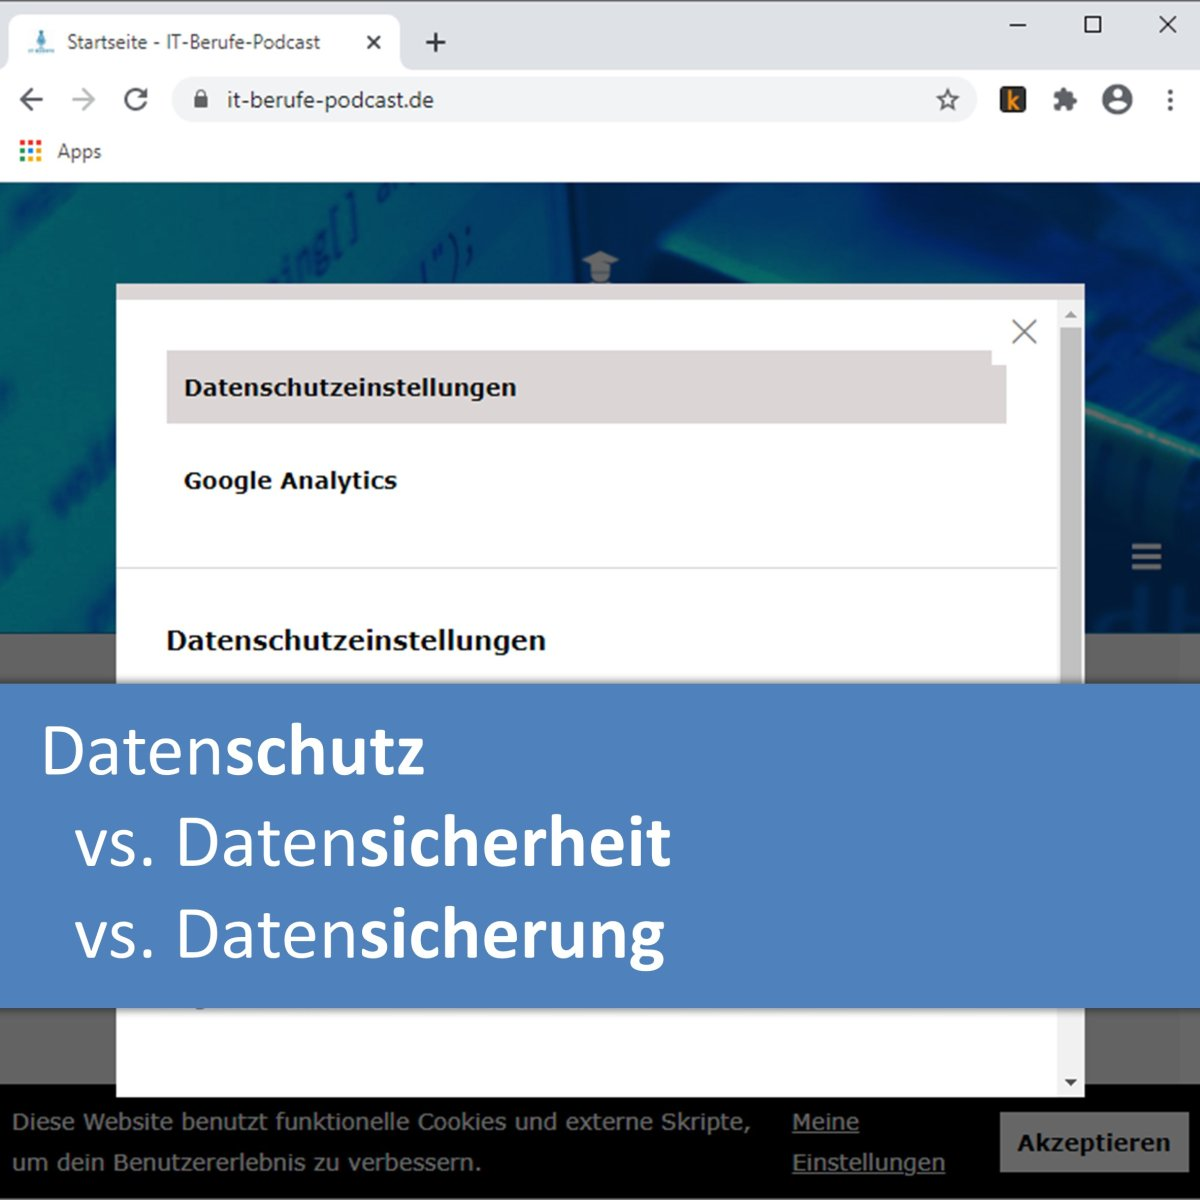 Datenschutz vs. Datensicherheit vs. Datensicherung